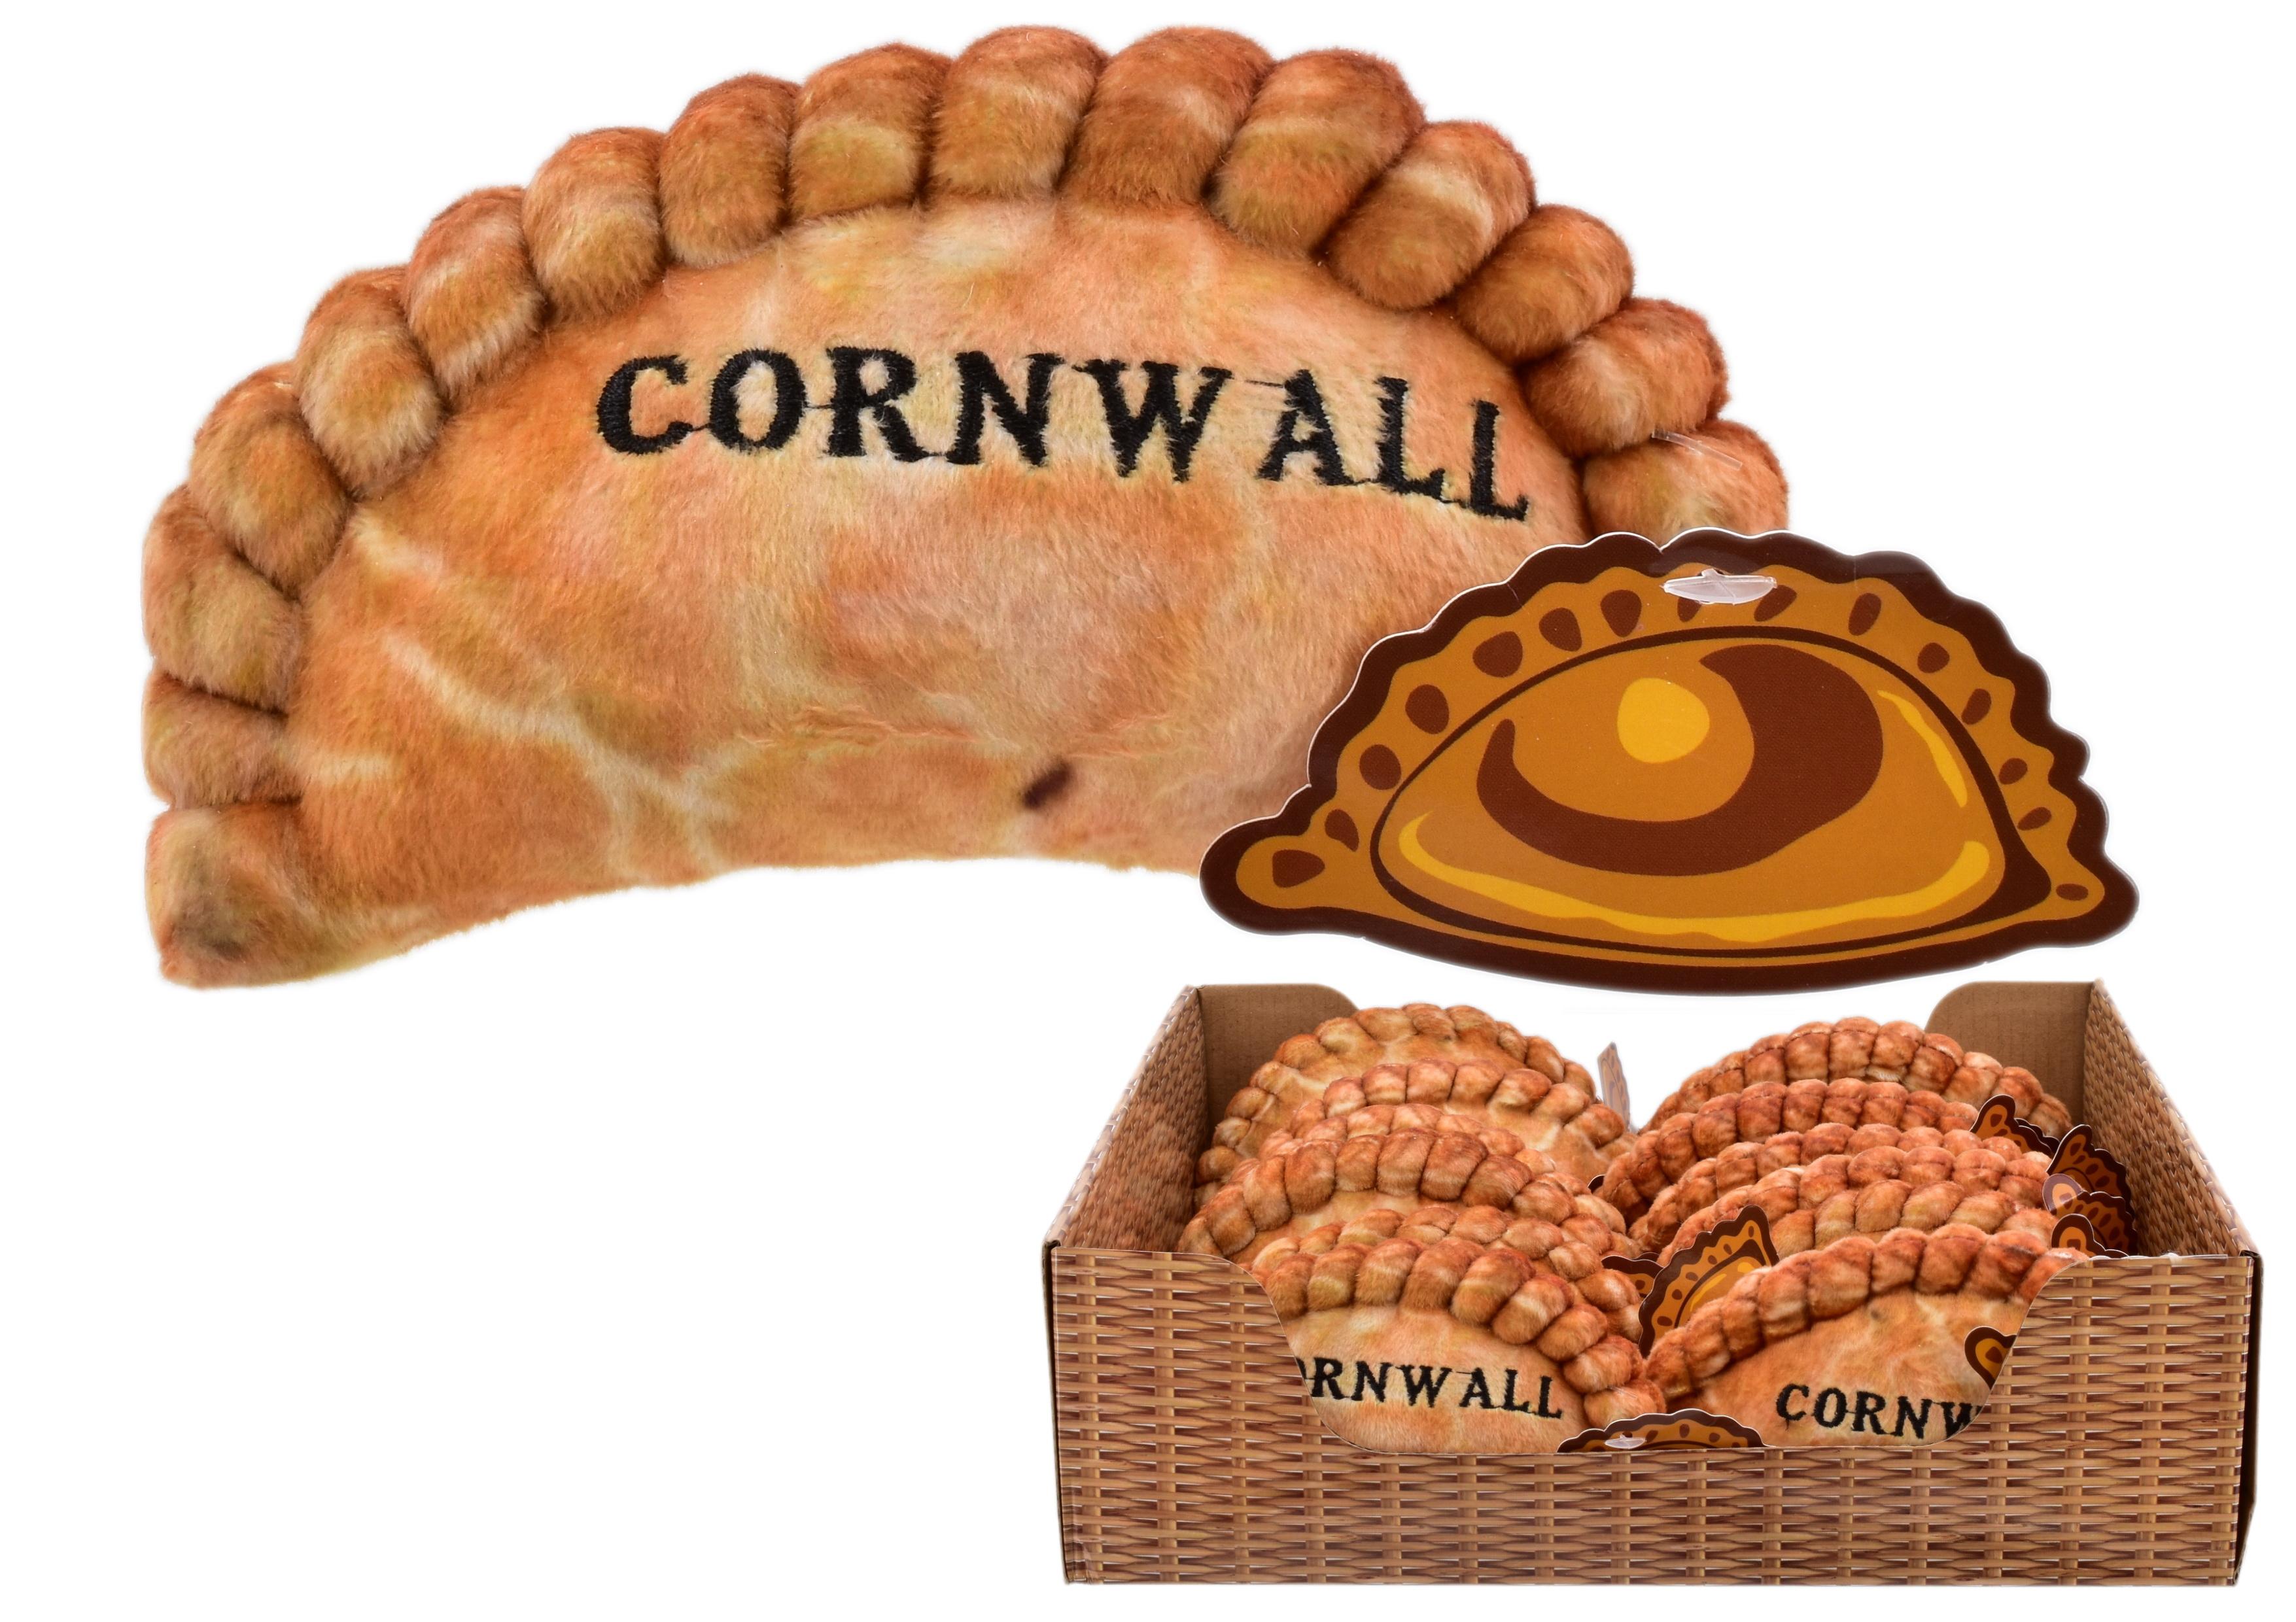 15cm Plush Pasty Cornwall In Display Box